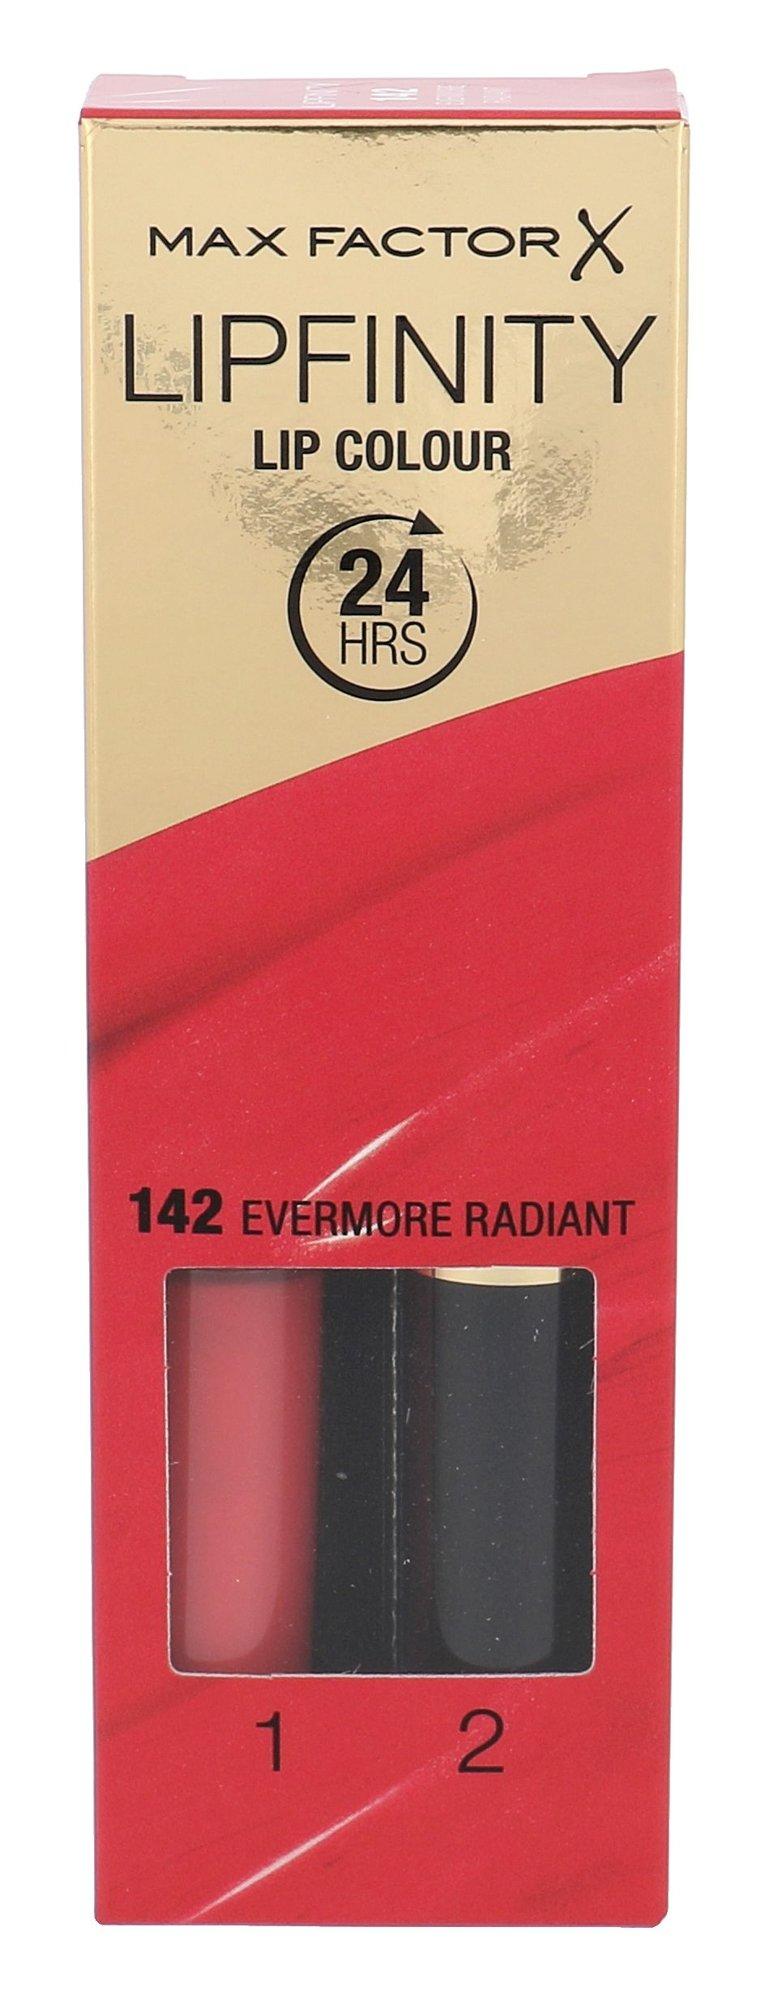 Max Factor Lipfinity Cosmetic 4,2ml 142 Evermore Radiant